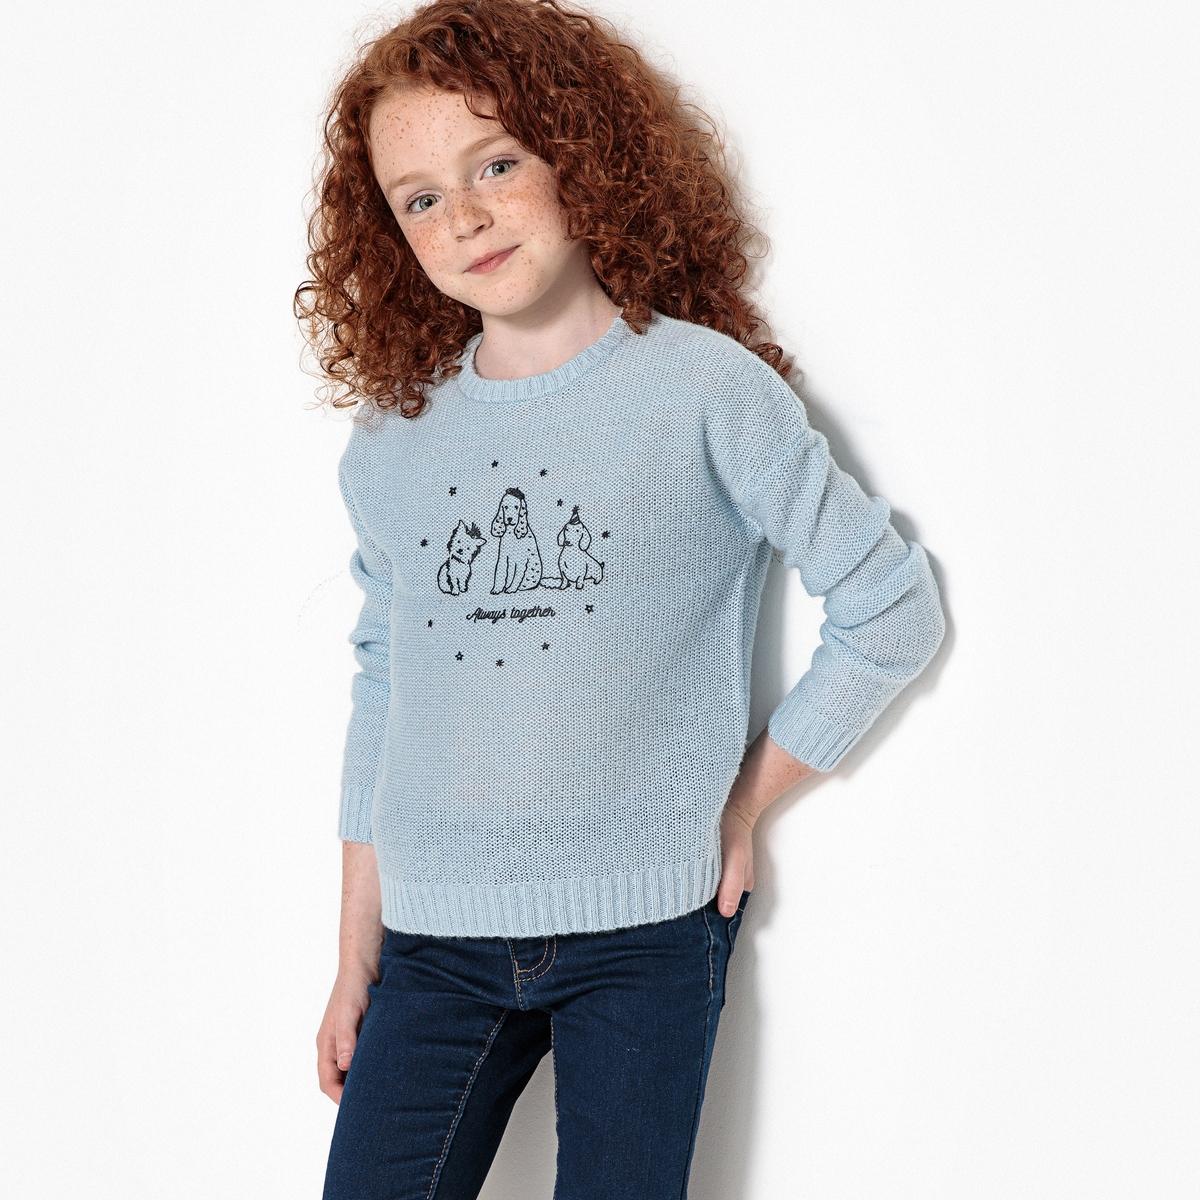 Пуловер La Redoute С рисунком собака из тонкого трикотажа 10 лет - 138 см синий цена